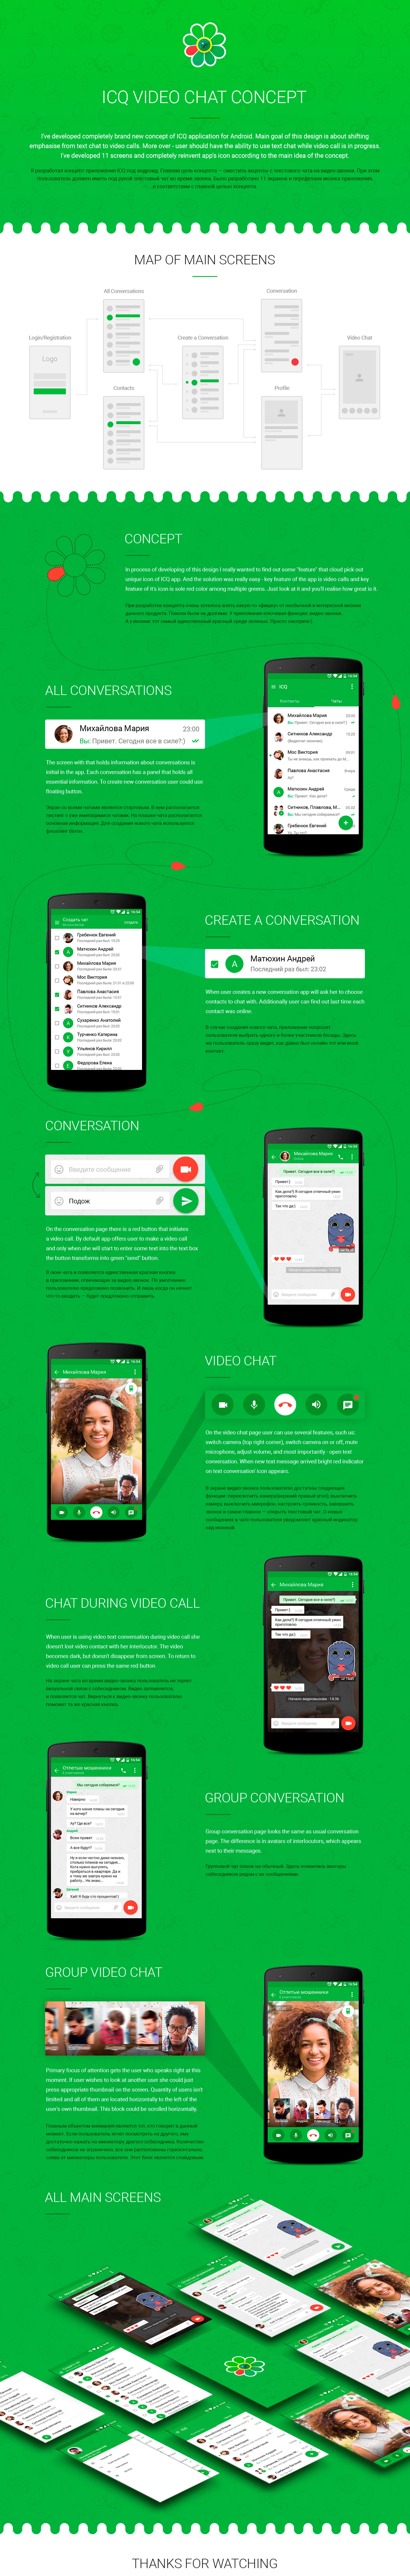 I've developed completely brand new concept of ICQ